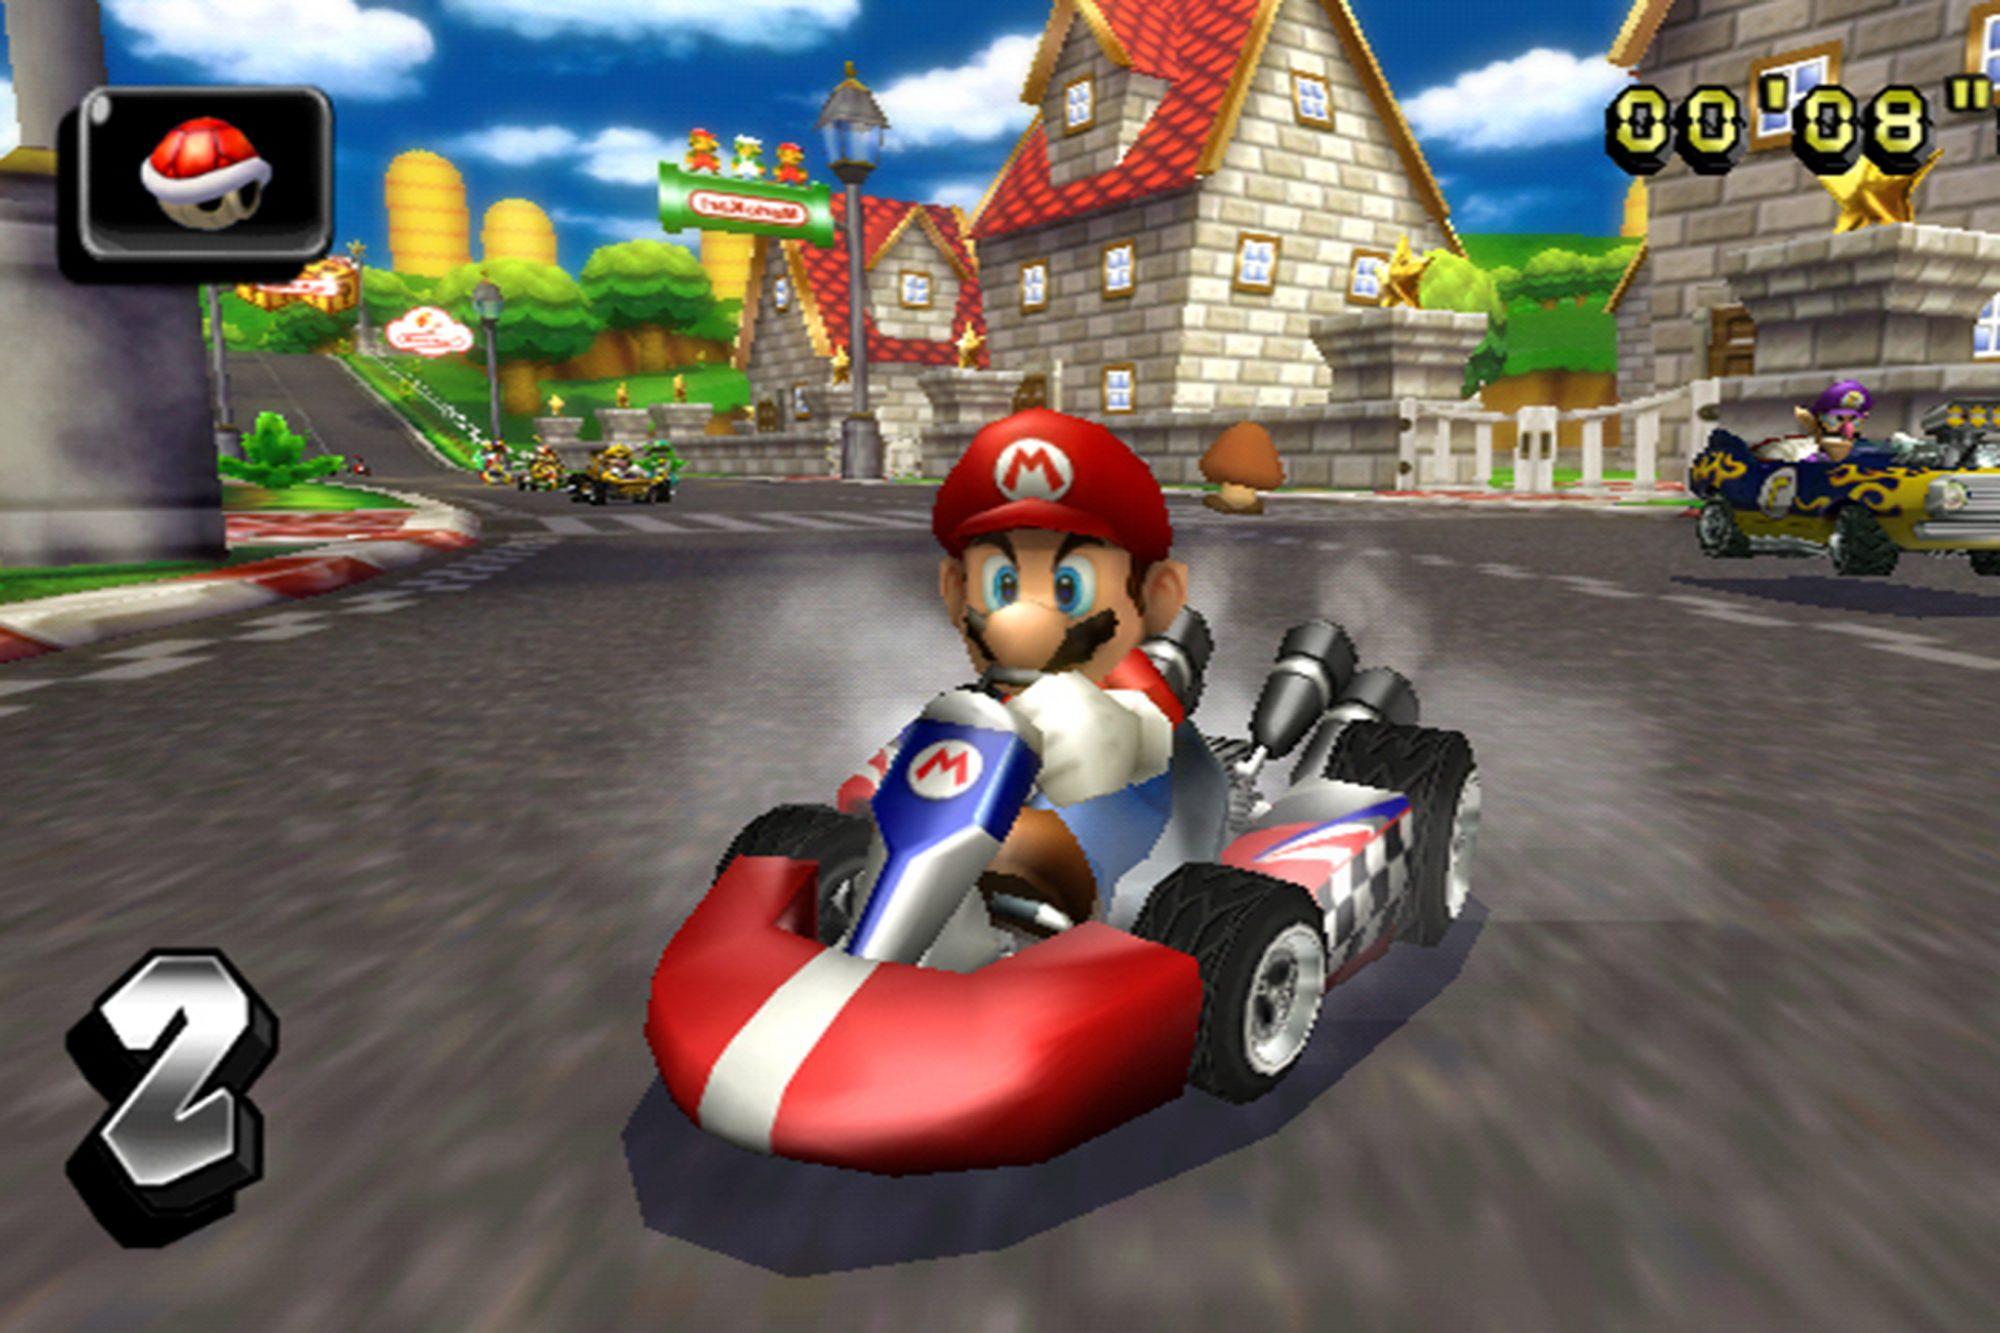 Mario Kart for WiiVideo Game, Nintendo 2008